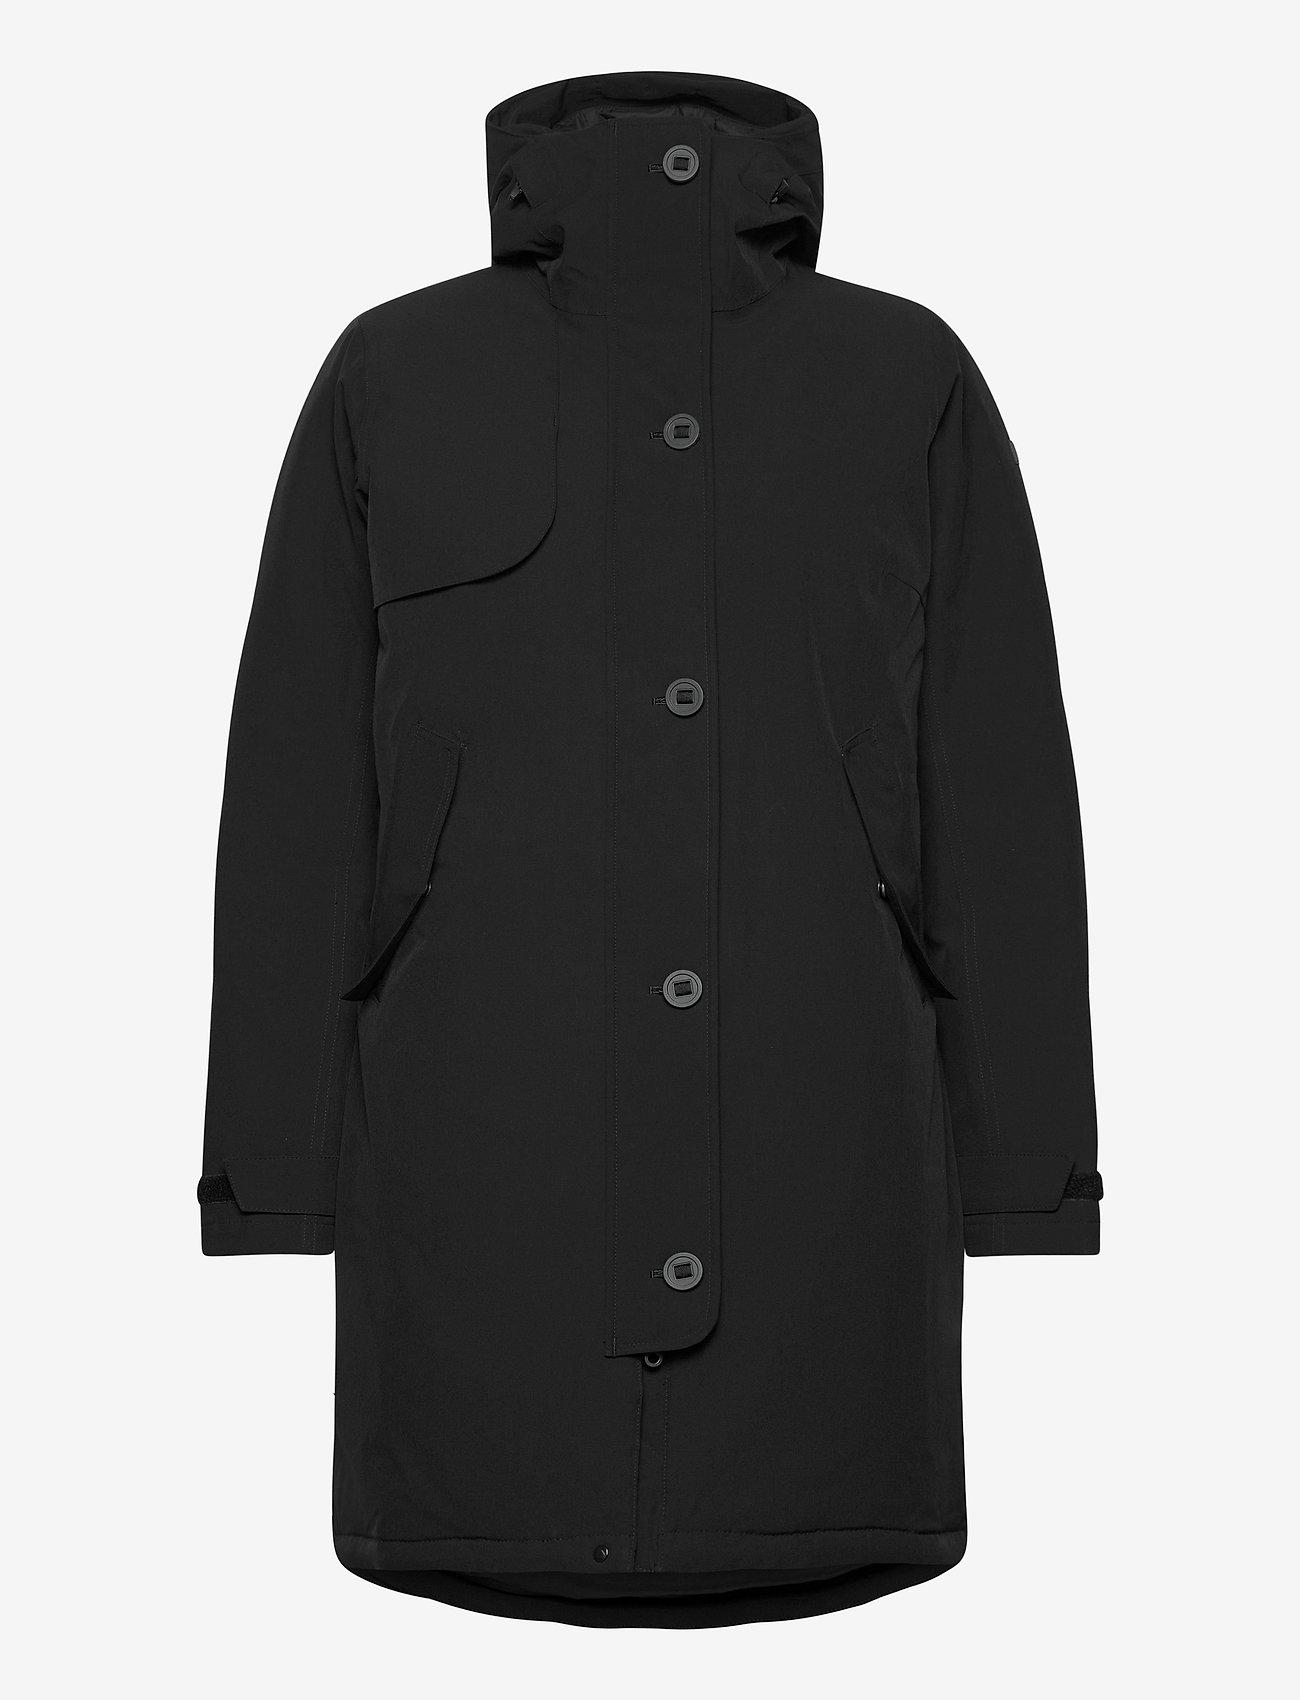 Bergans - Oslo Down W Parka - down jackets - black - 1